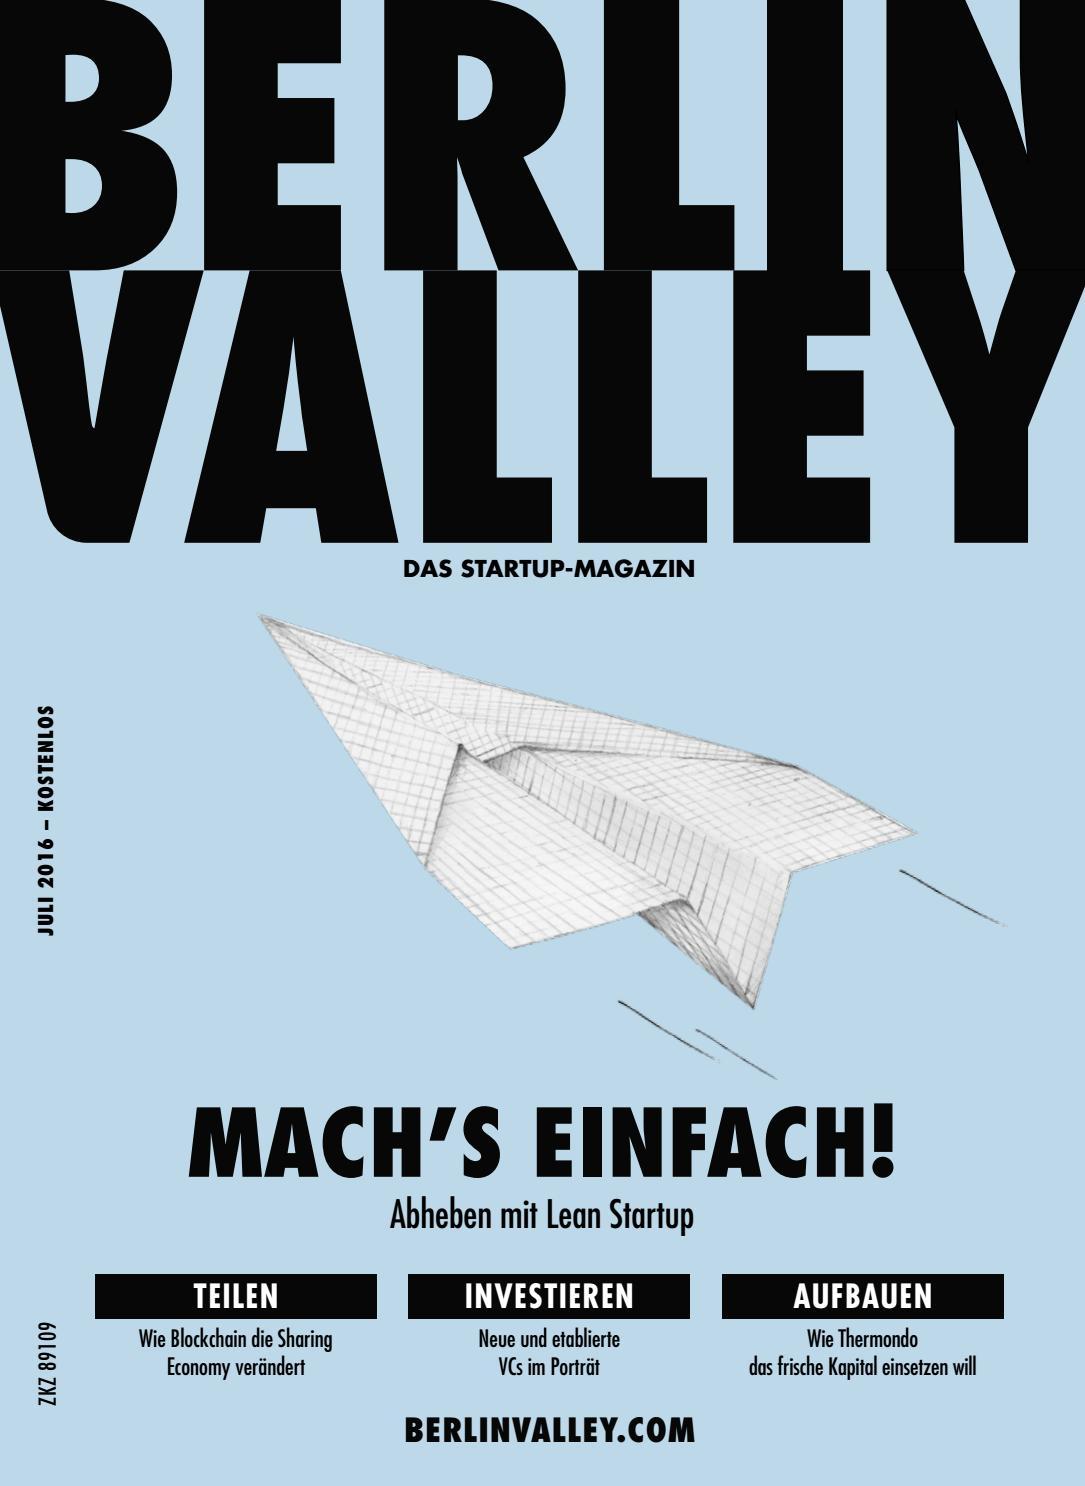 Berlin Valley 16 - July 2016 by NKF Media - issuu